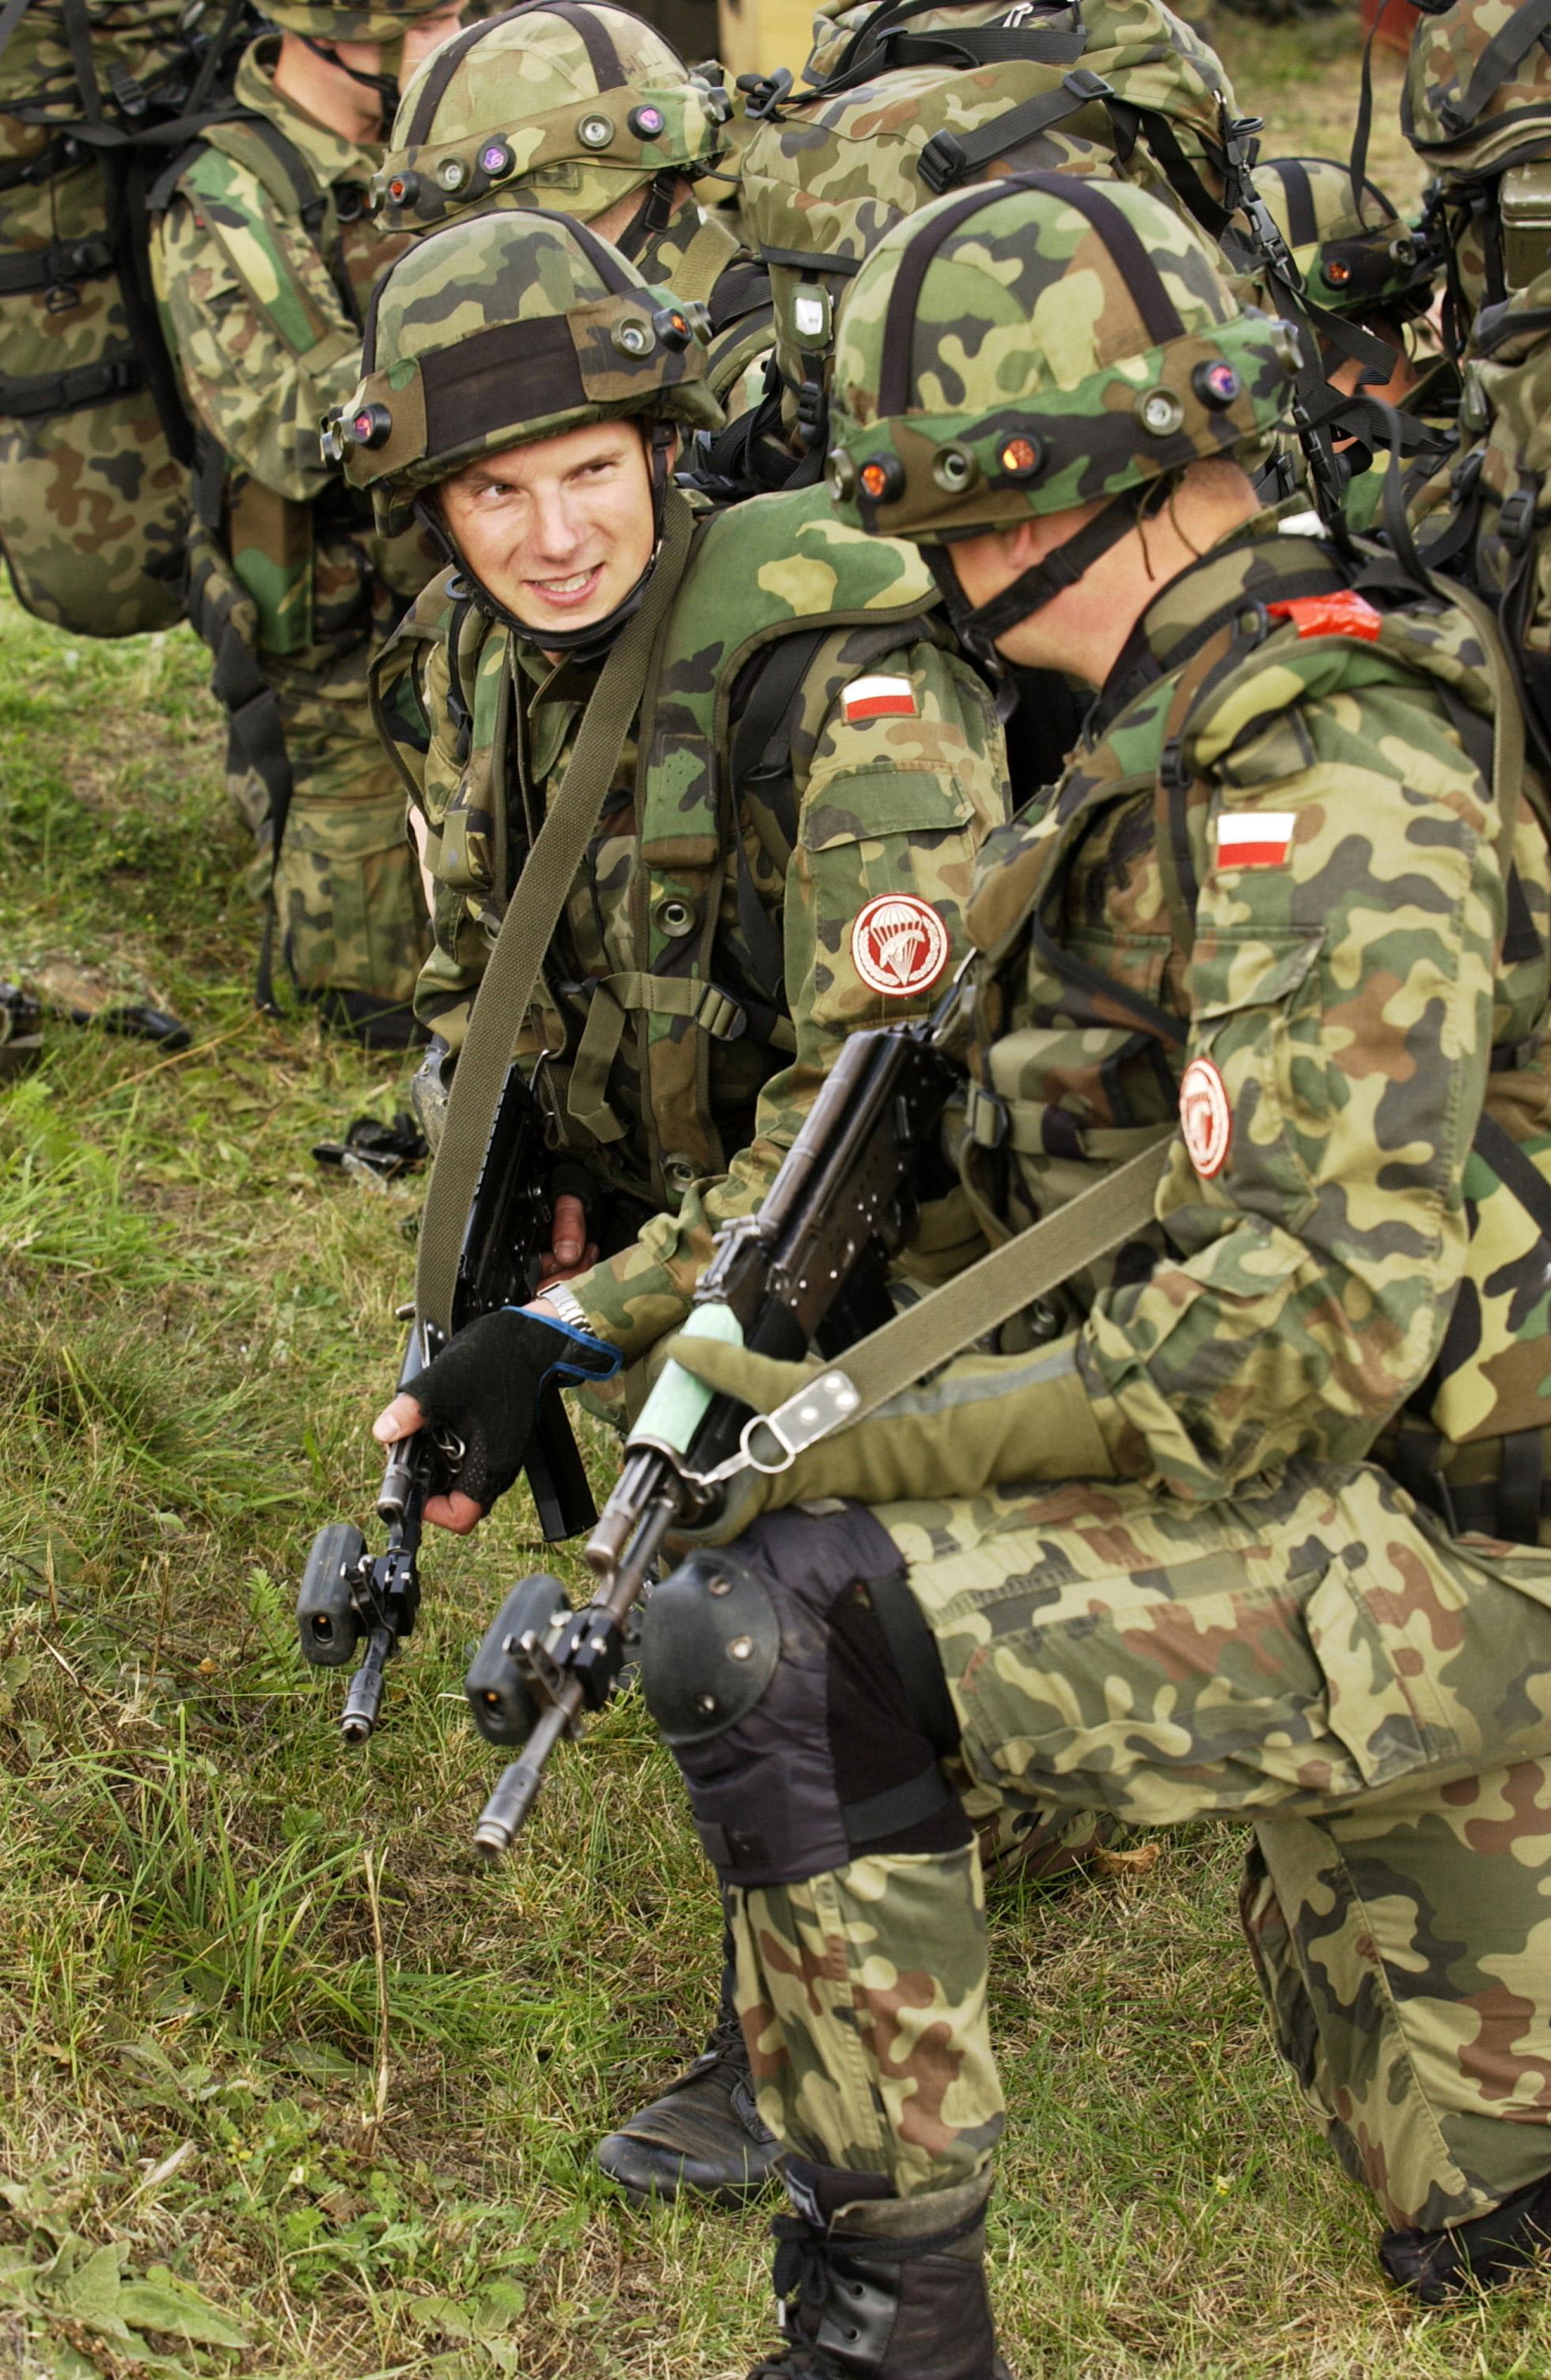 Polish Armed Forces | Military Wiki | FANDOM powered by Wikia